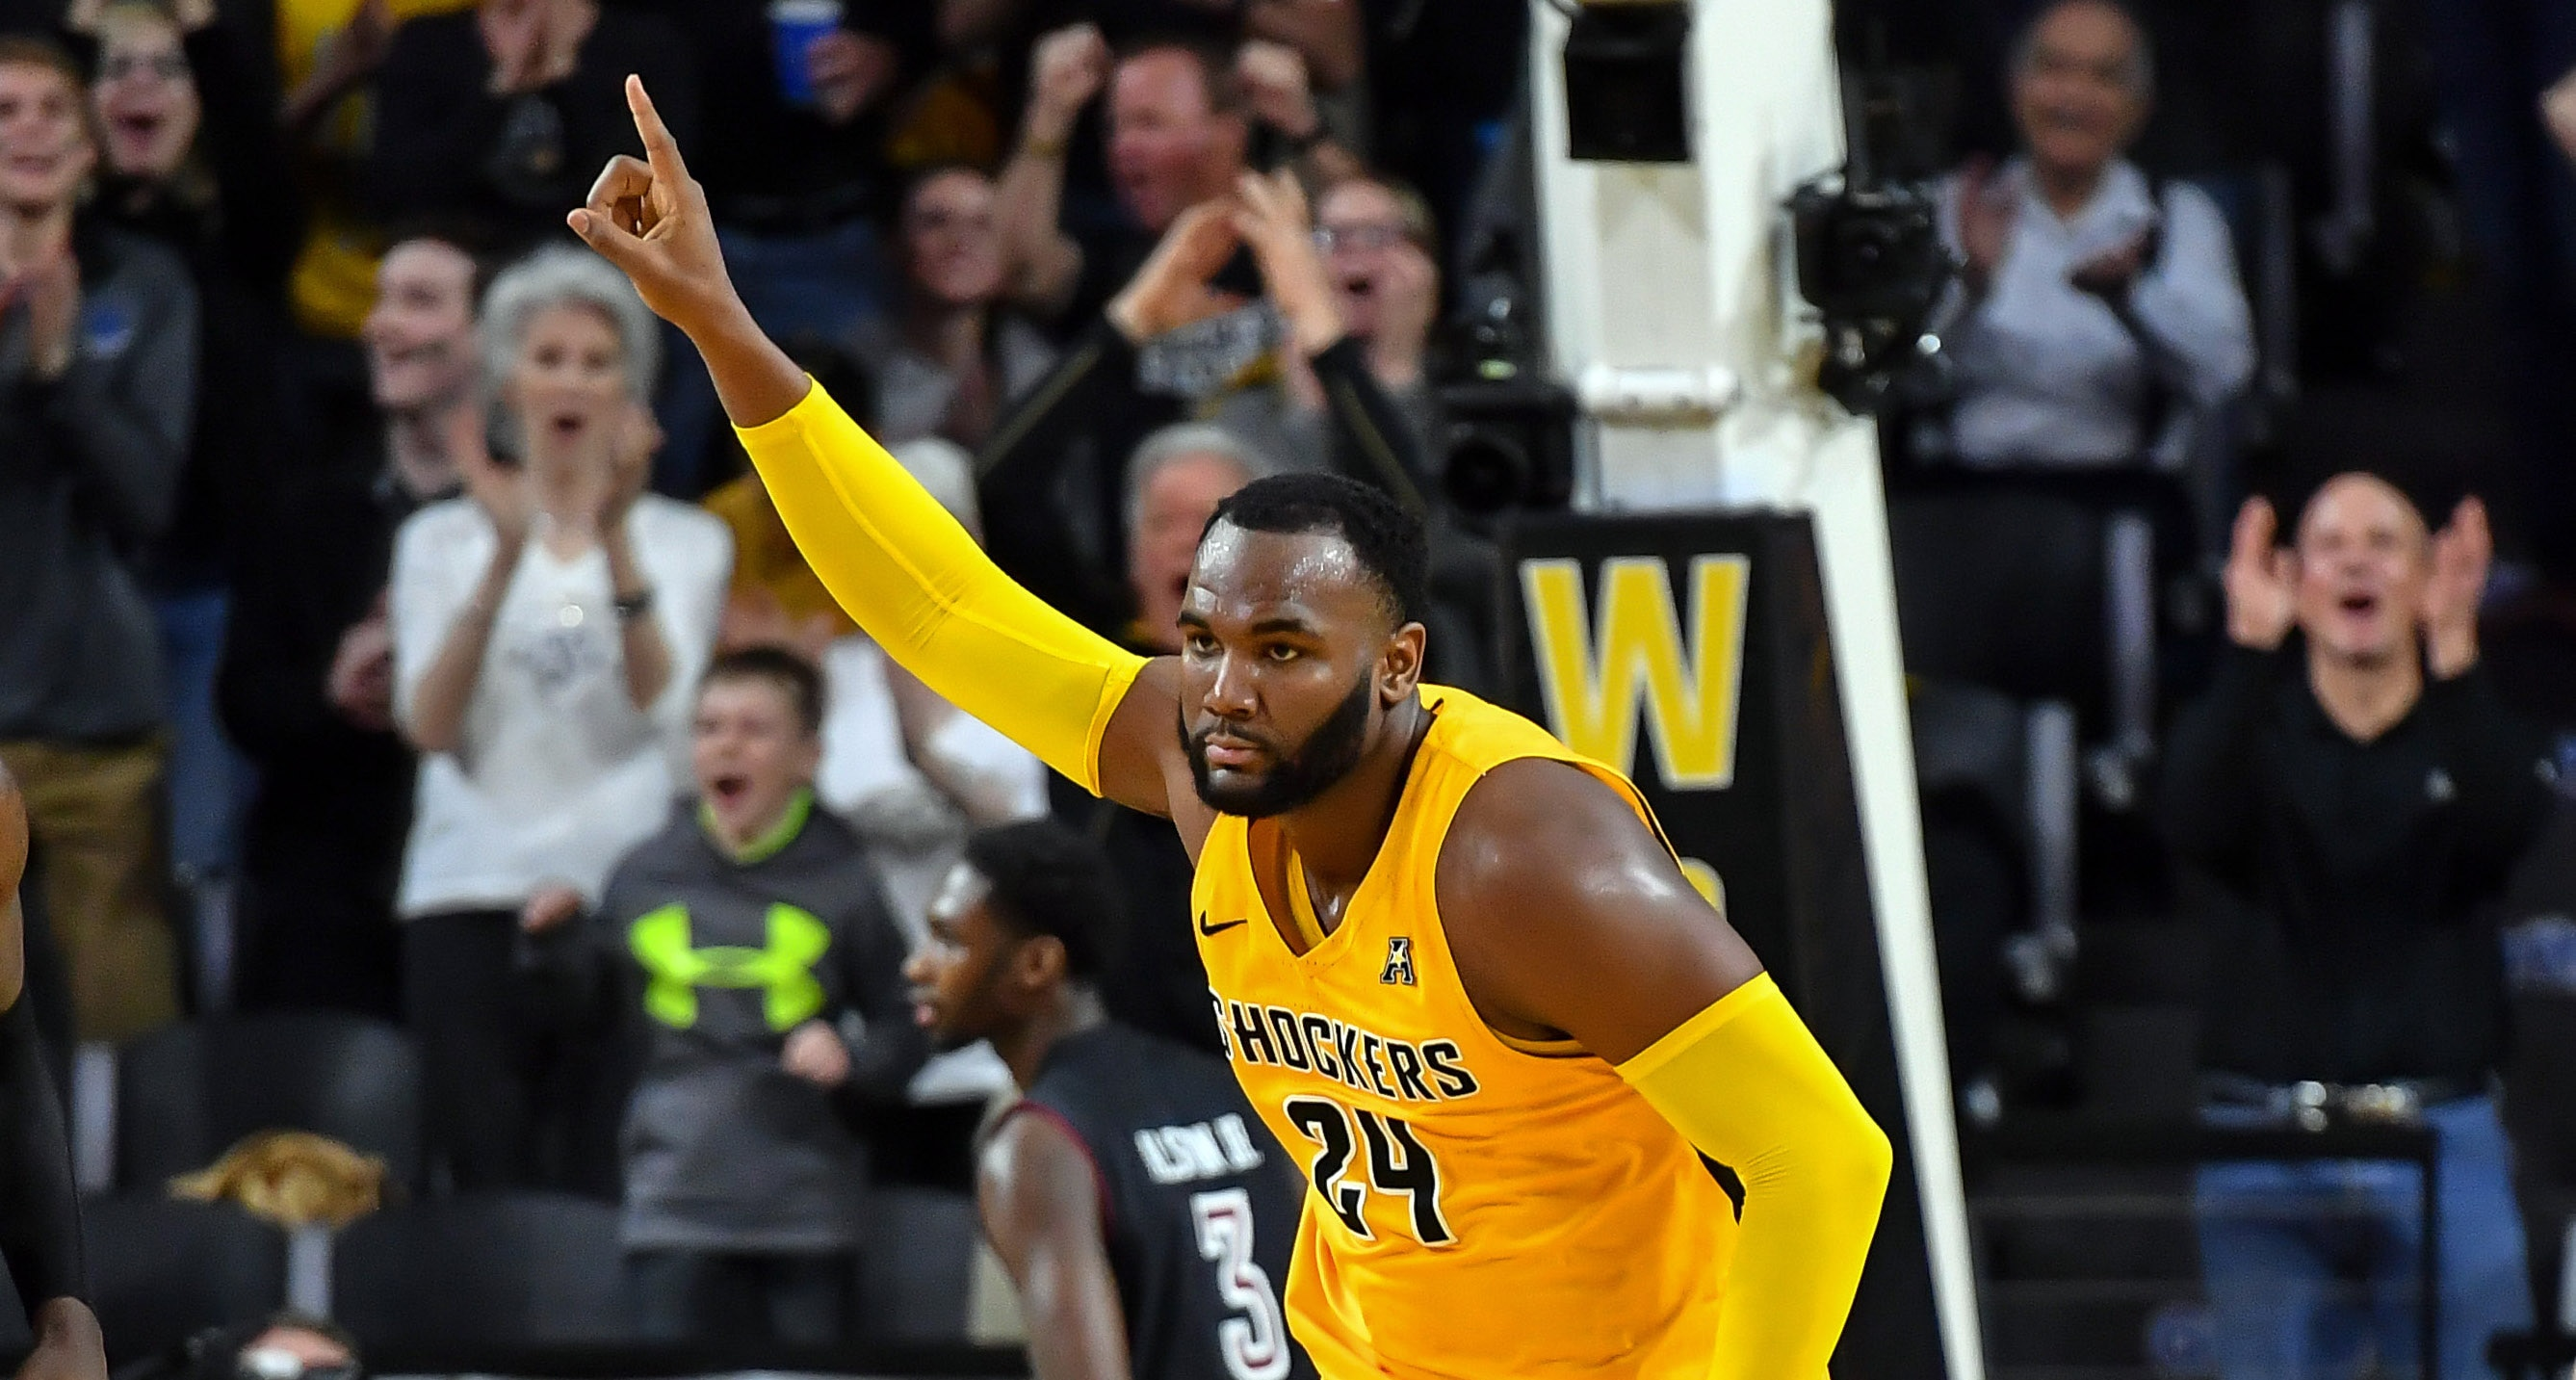 8baea34b476 https   www.ncaa.com news basketball-men article 2018-02-10 ...